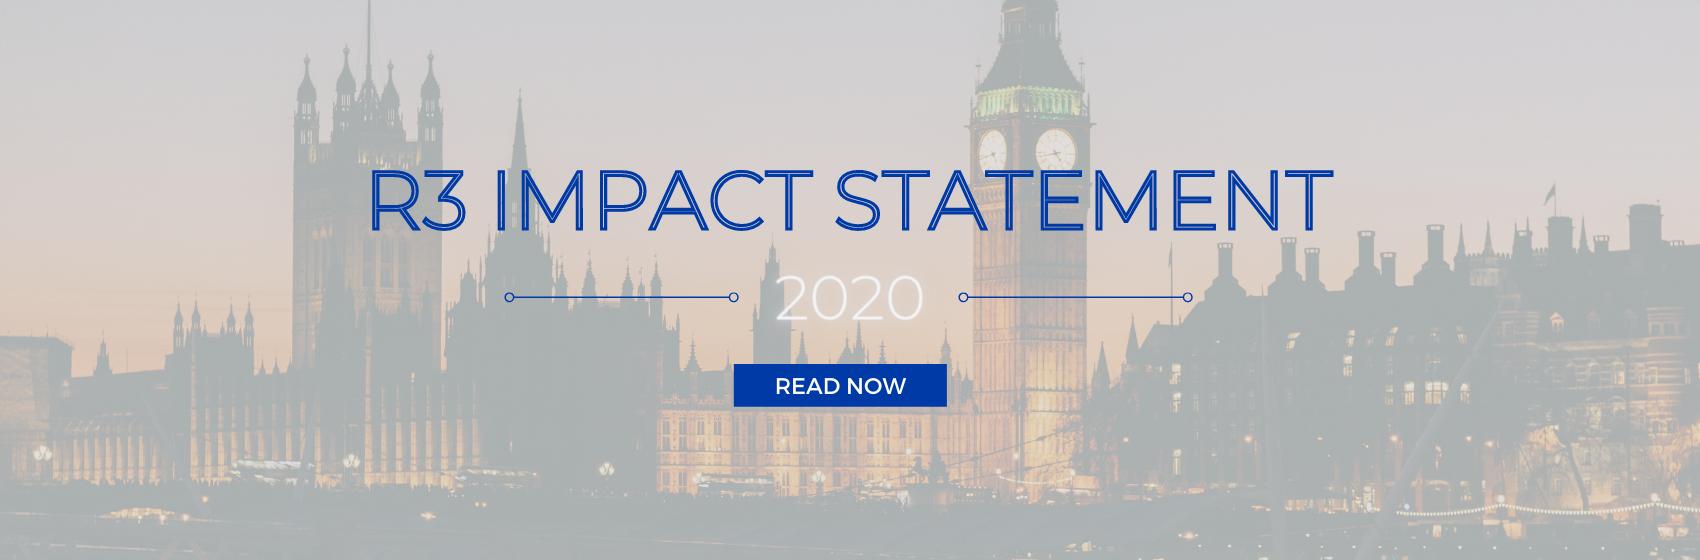 Impact Statement 2020